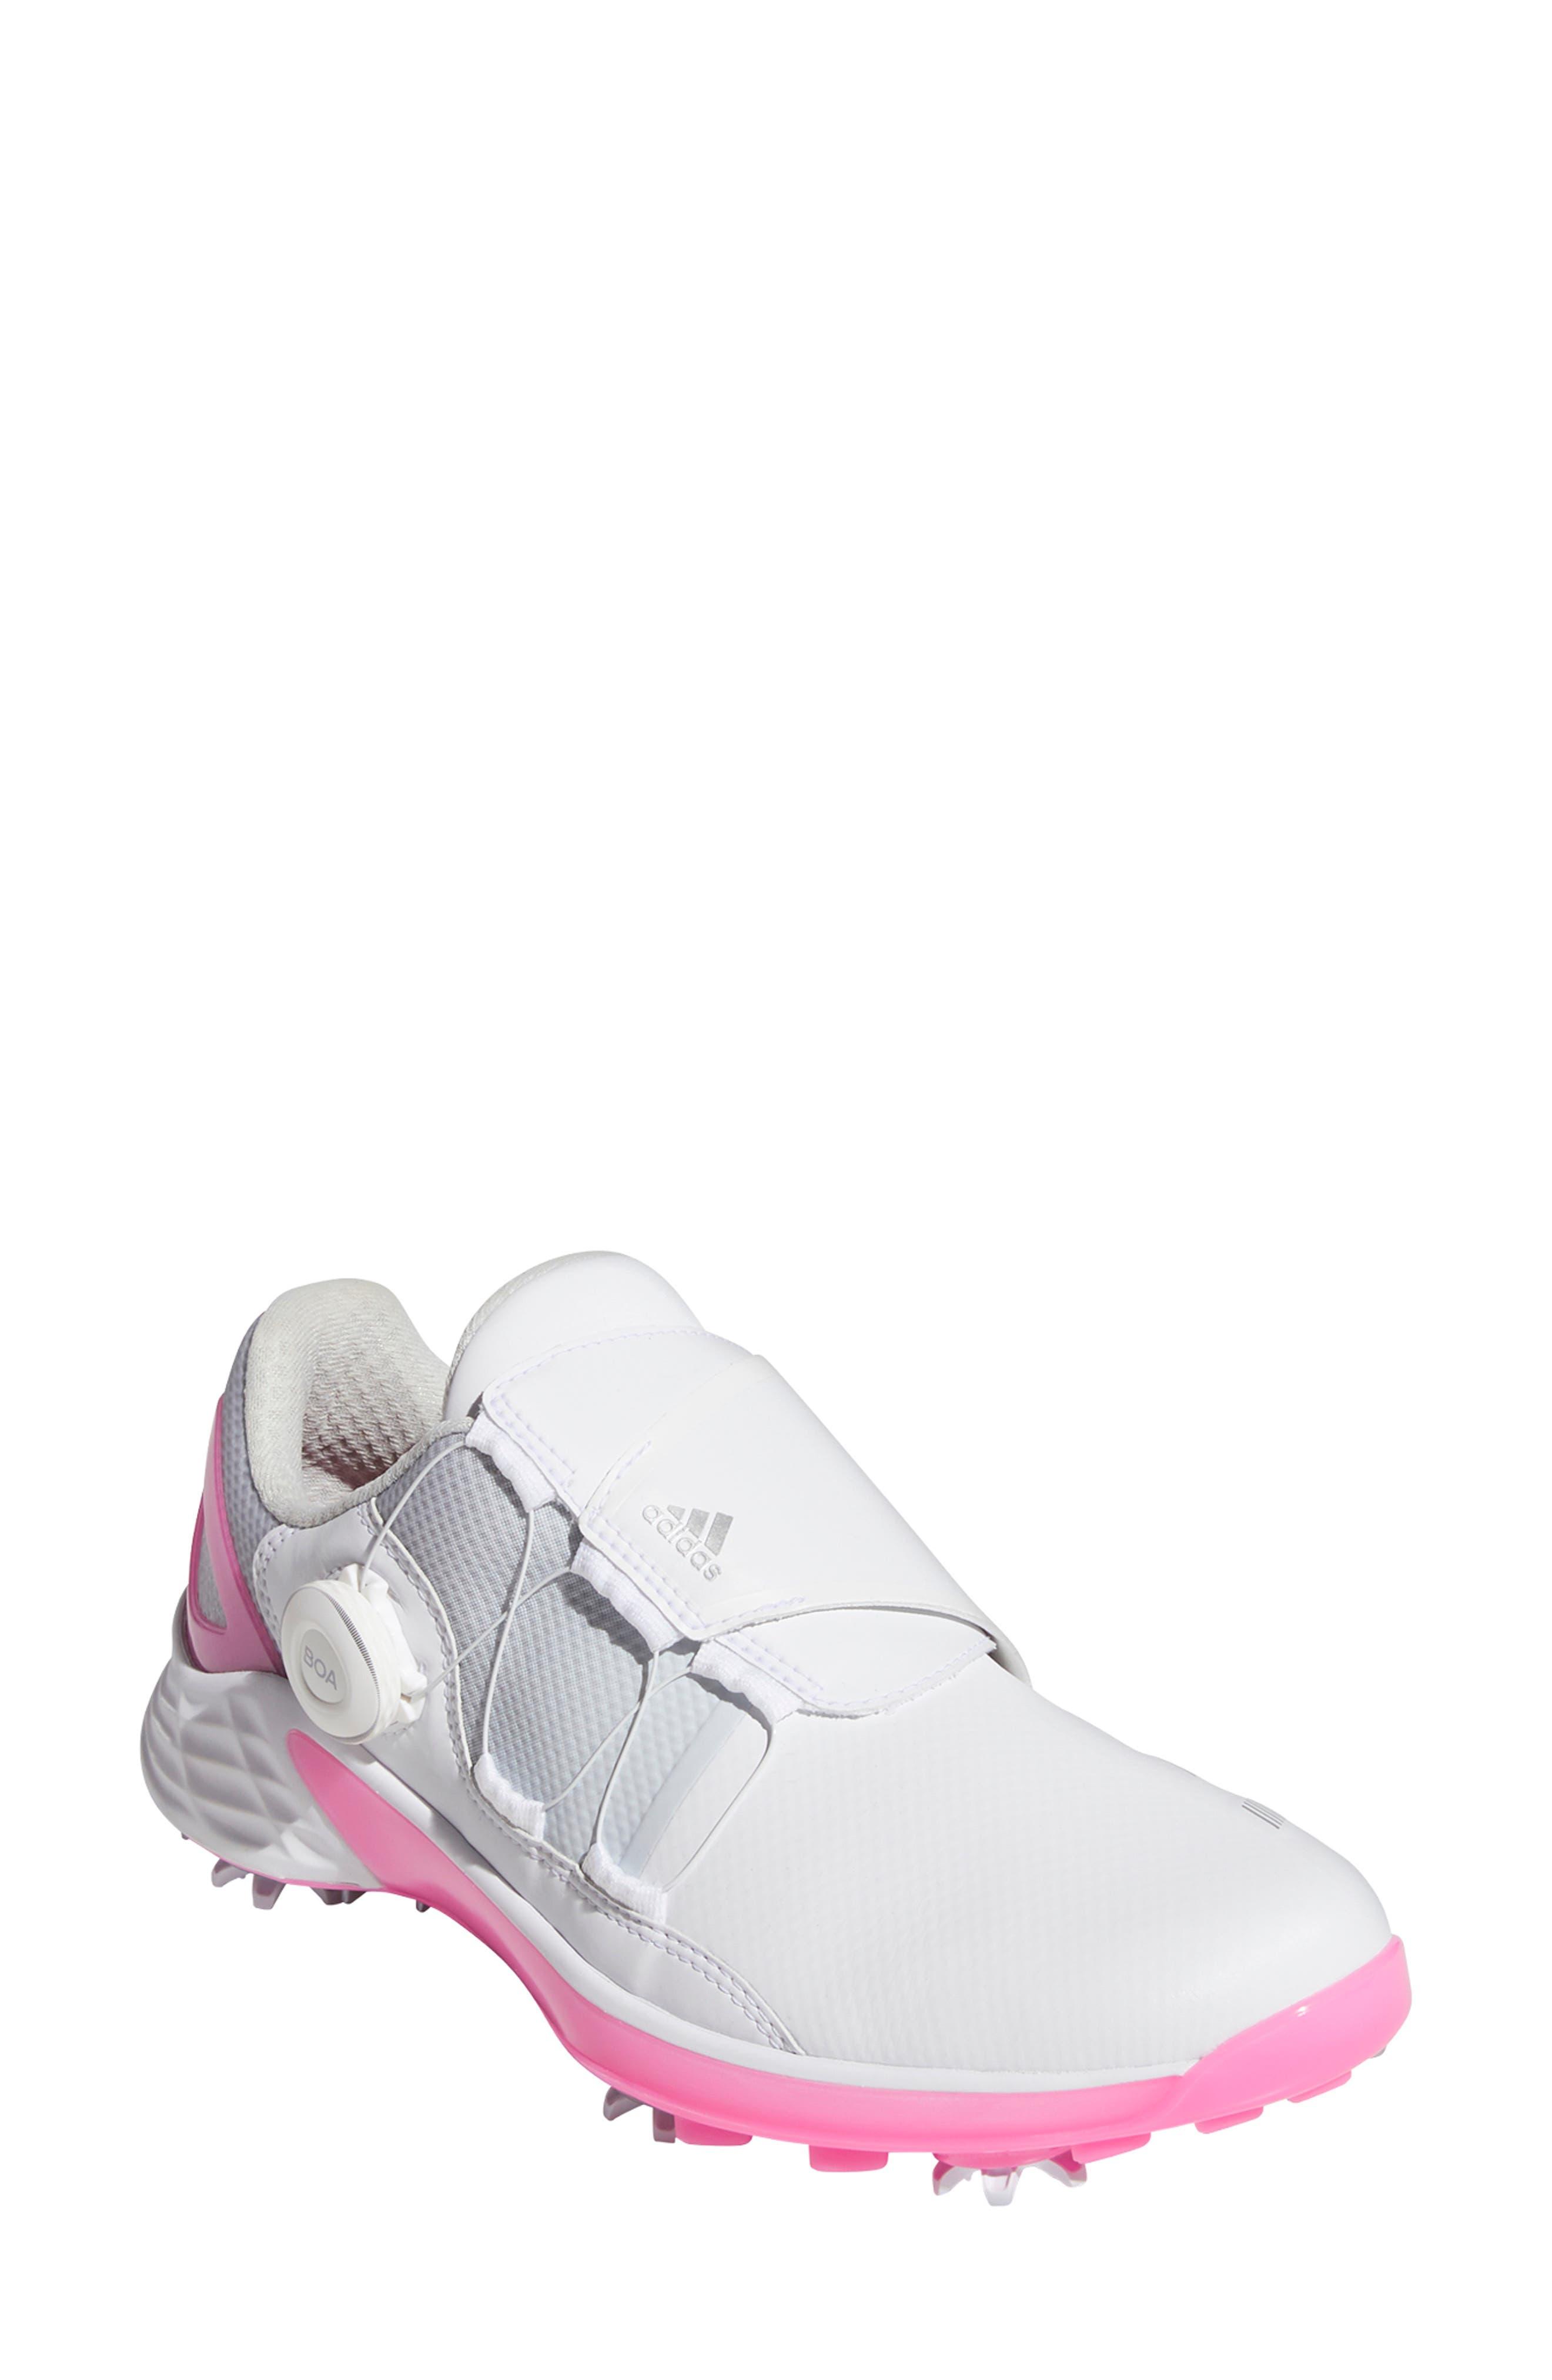 Women's Adidas Zg21 Boa Waterproof Golf Shoe